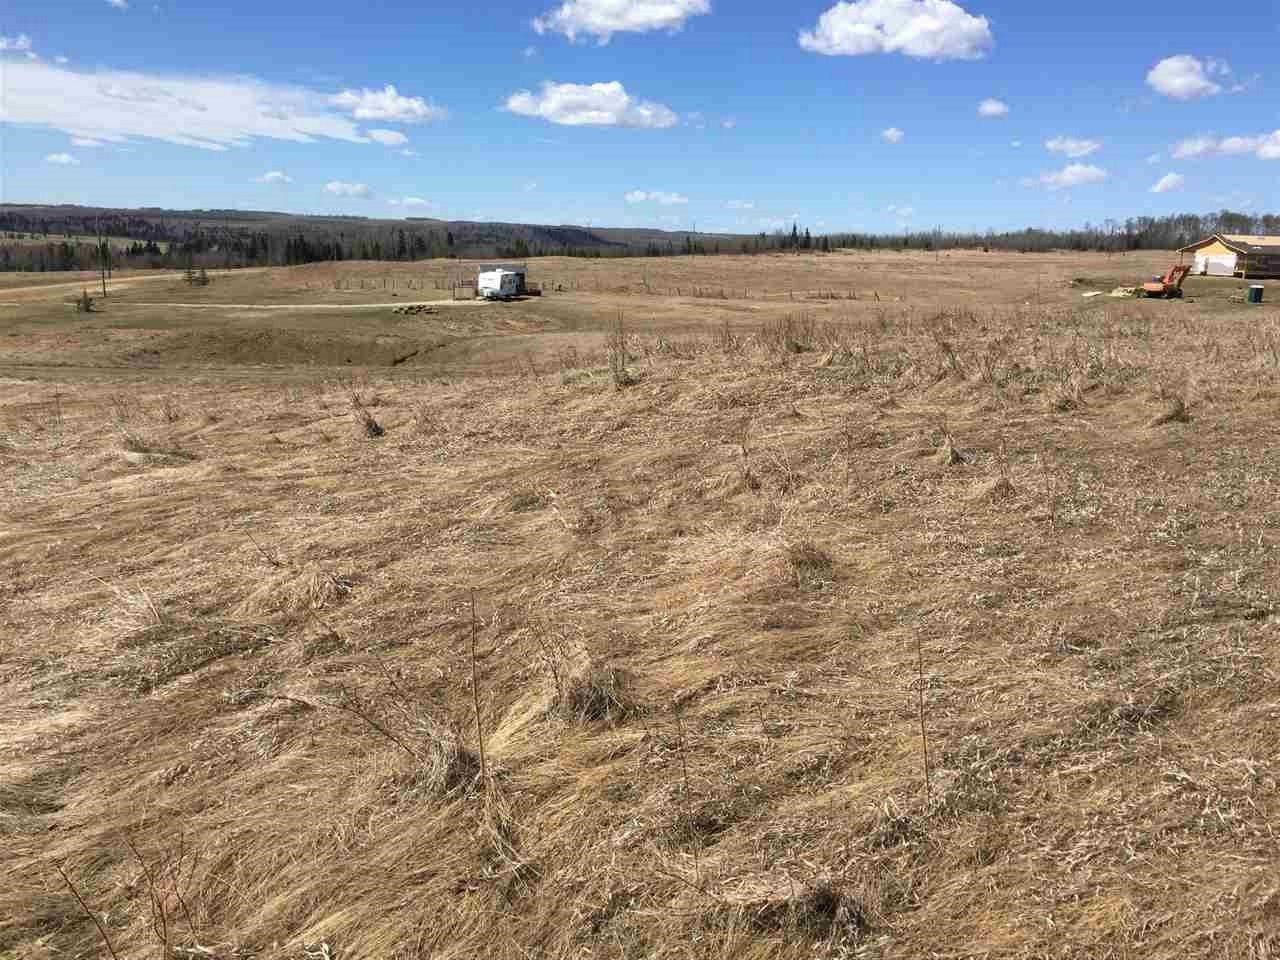 Main Photo: 16 River Ridge Estates: Rural Wetaskiwin County Rural Land/Vacant Lot for sale : MLS®# E4253383